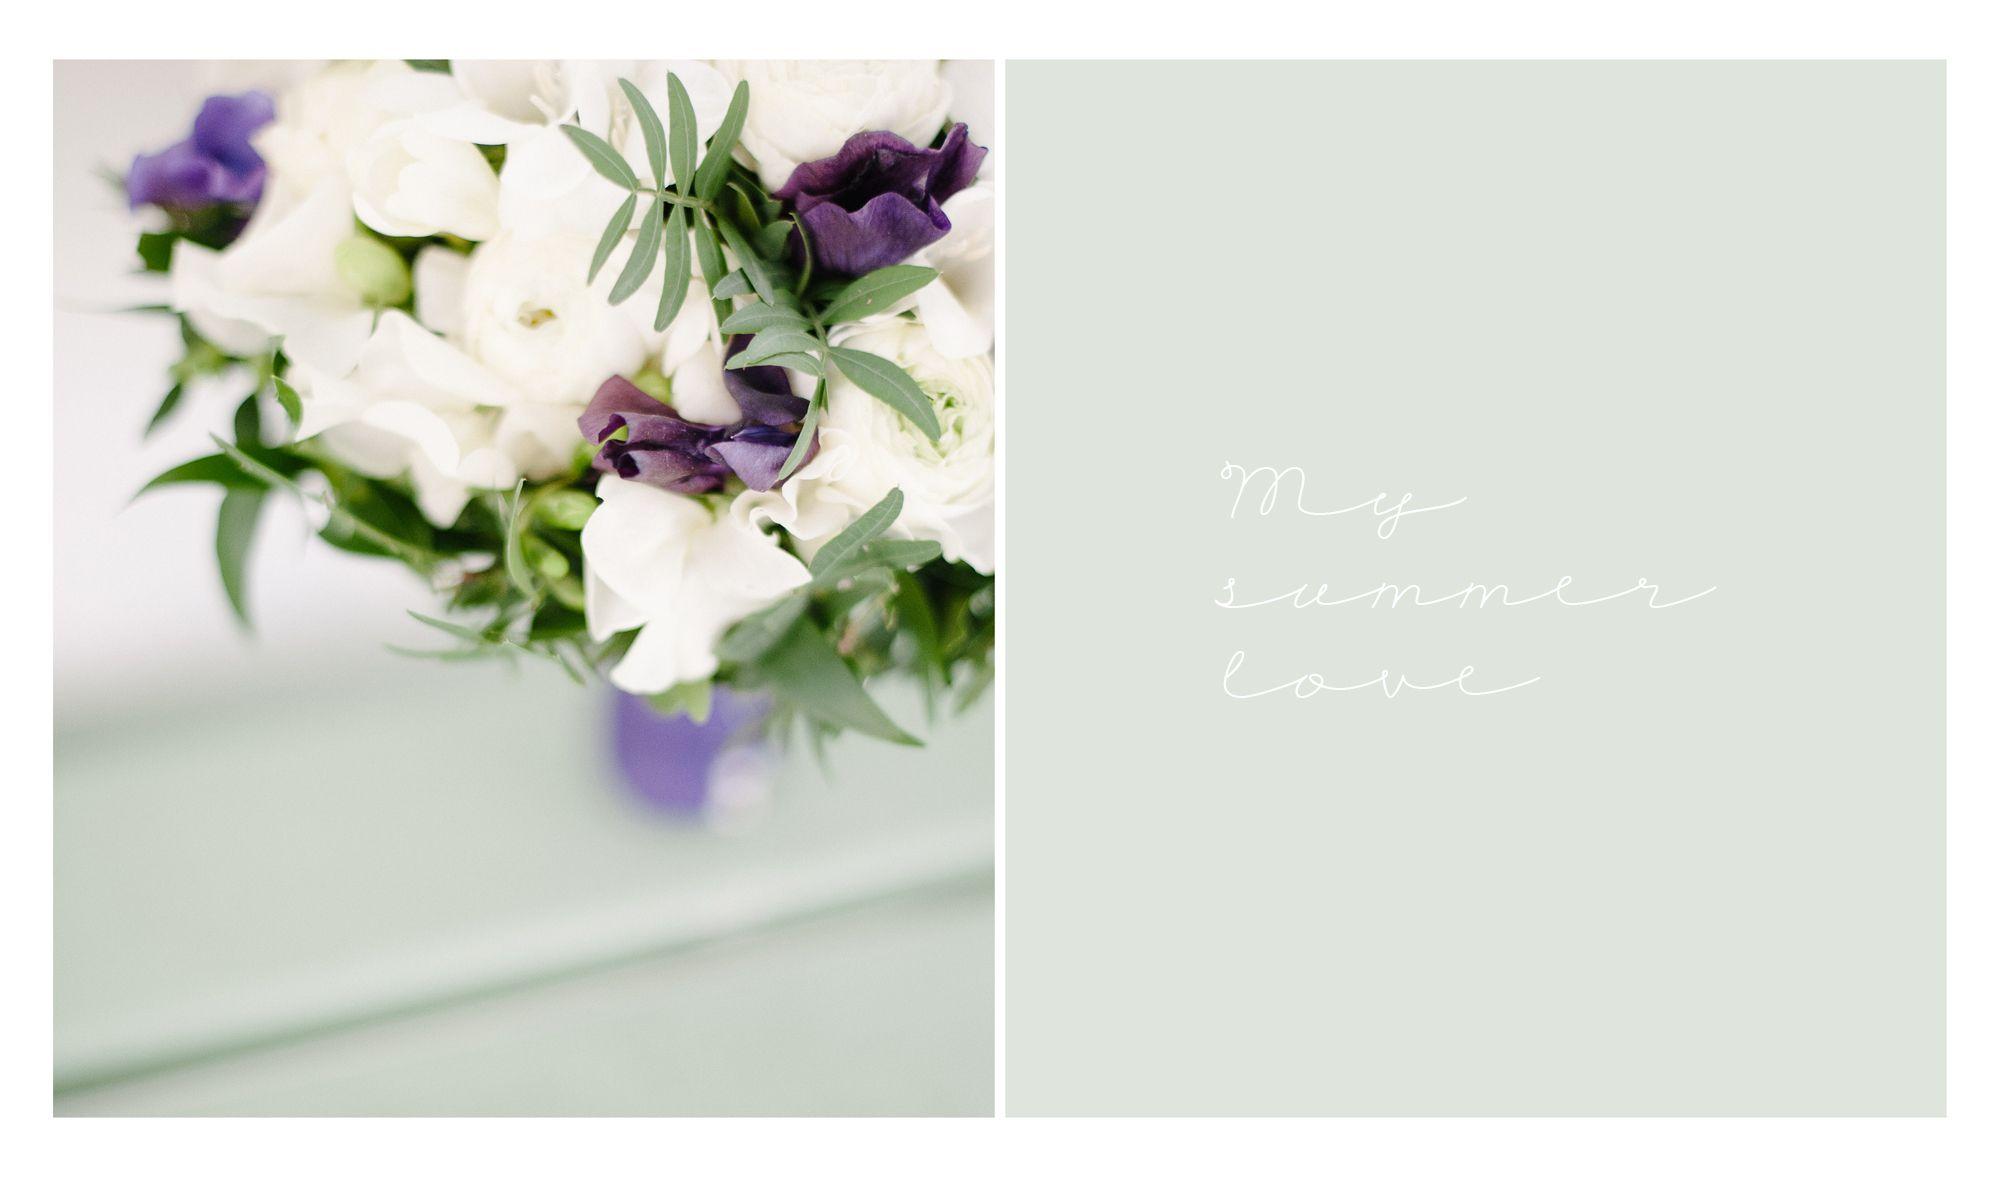 Flowers, summer, light - i love it